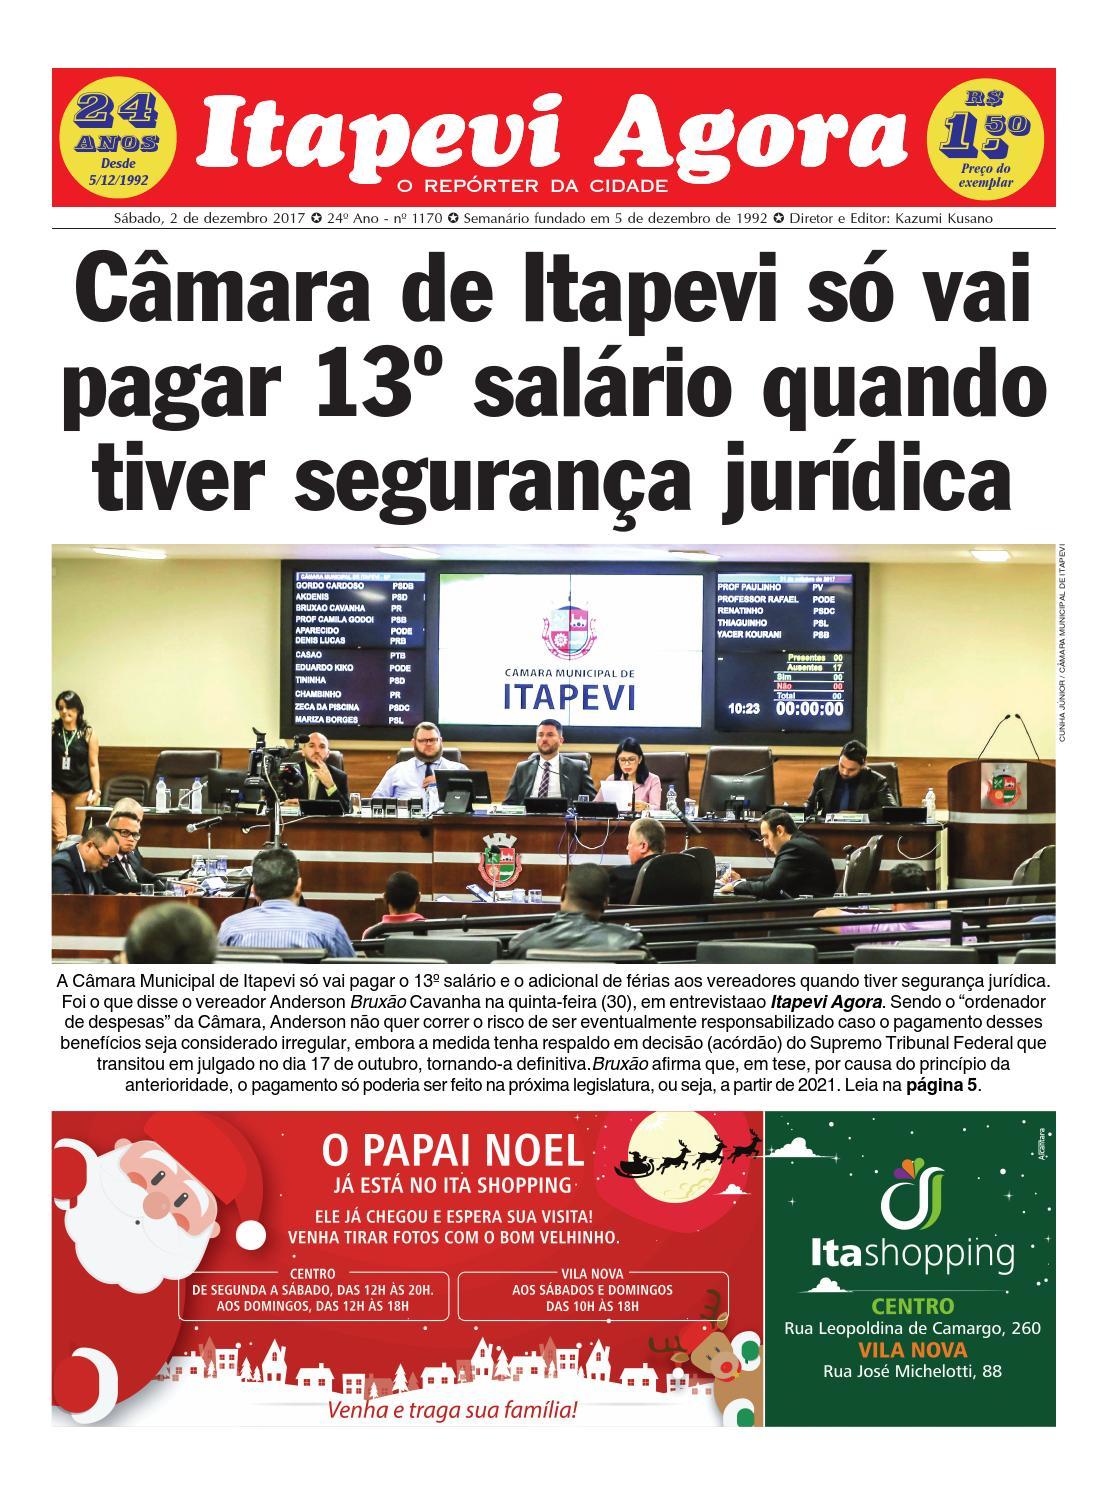 Itapevi Agora nº 1170 - 02.12.2017 by JORNAL ITAPEVI AGORA - issuu b4e3a29fd0